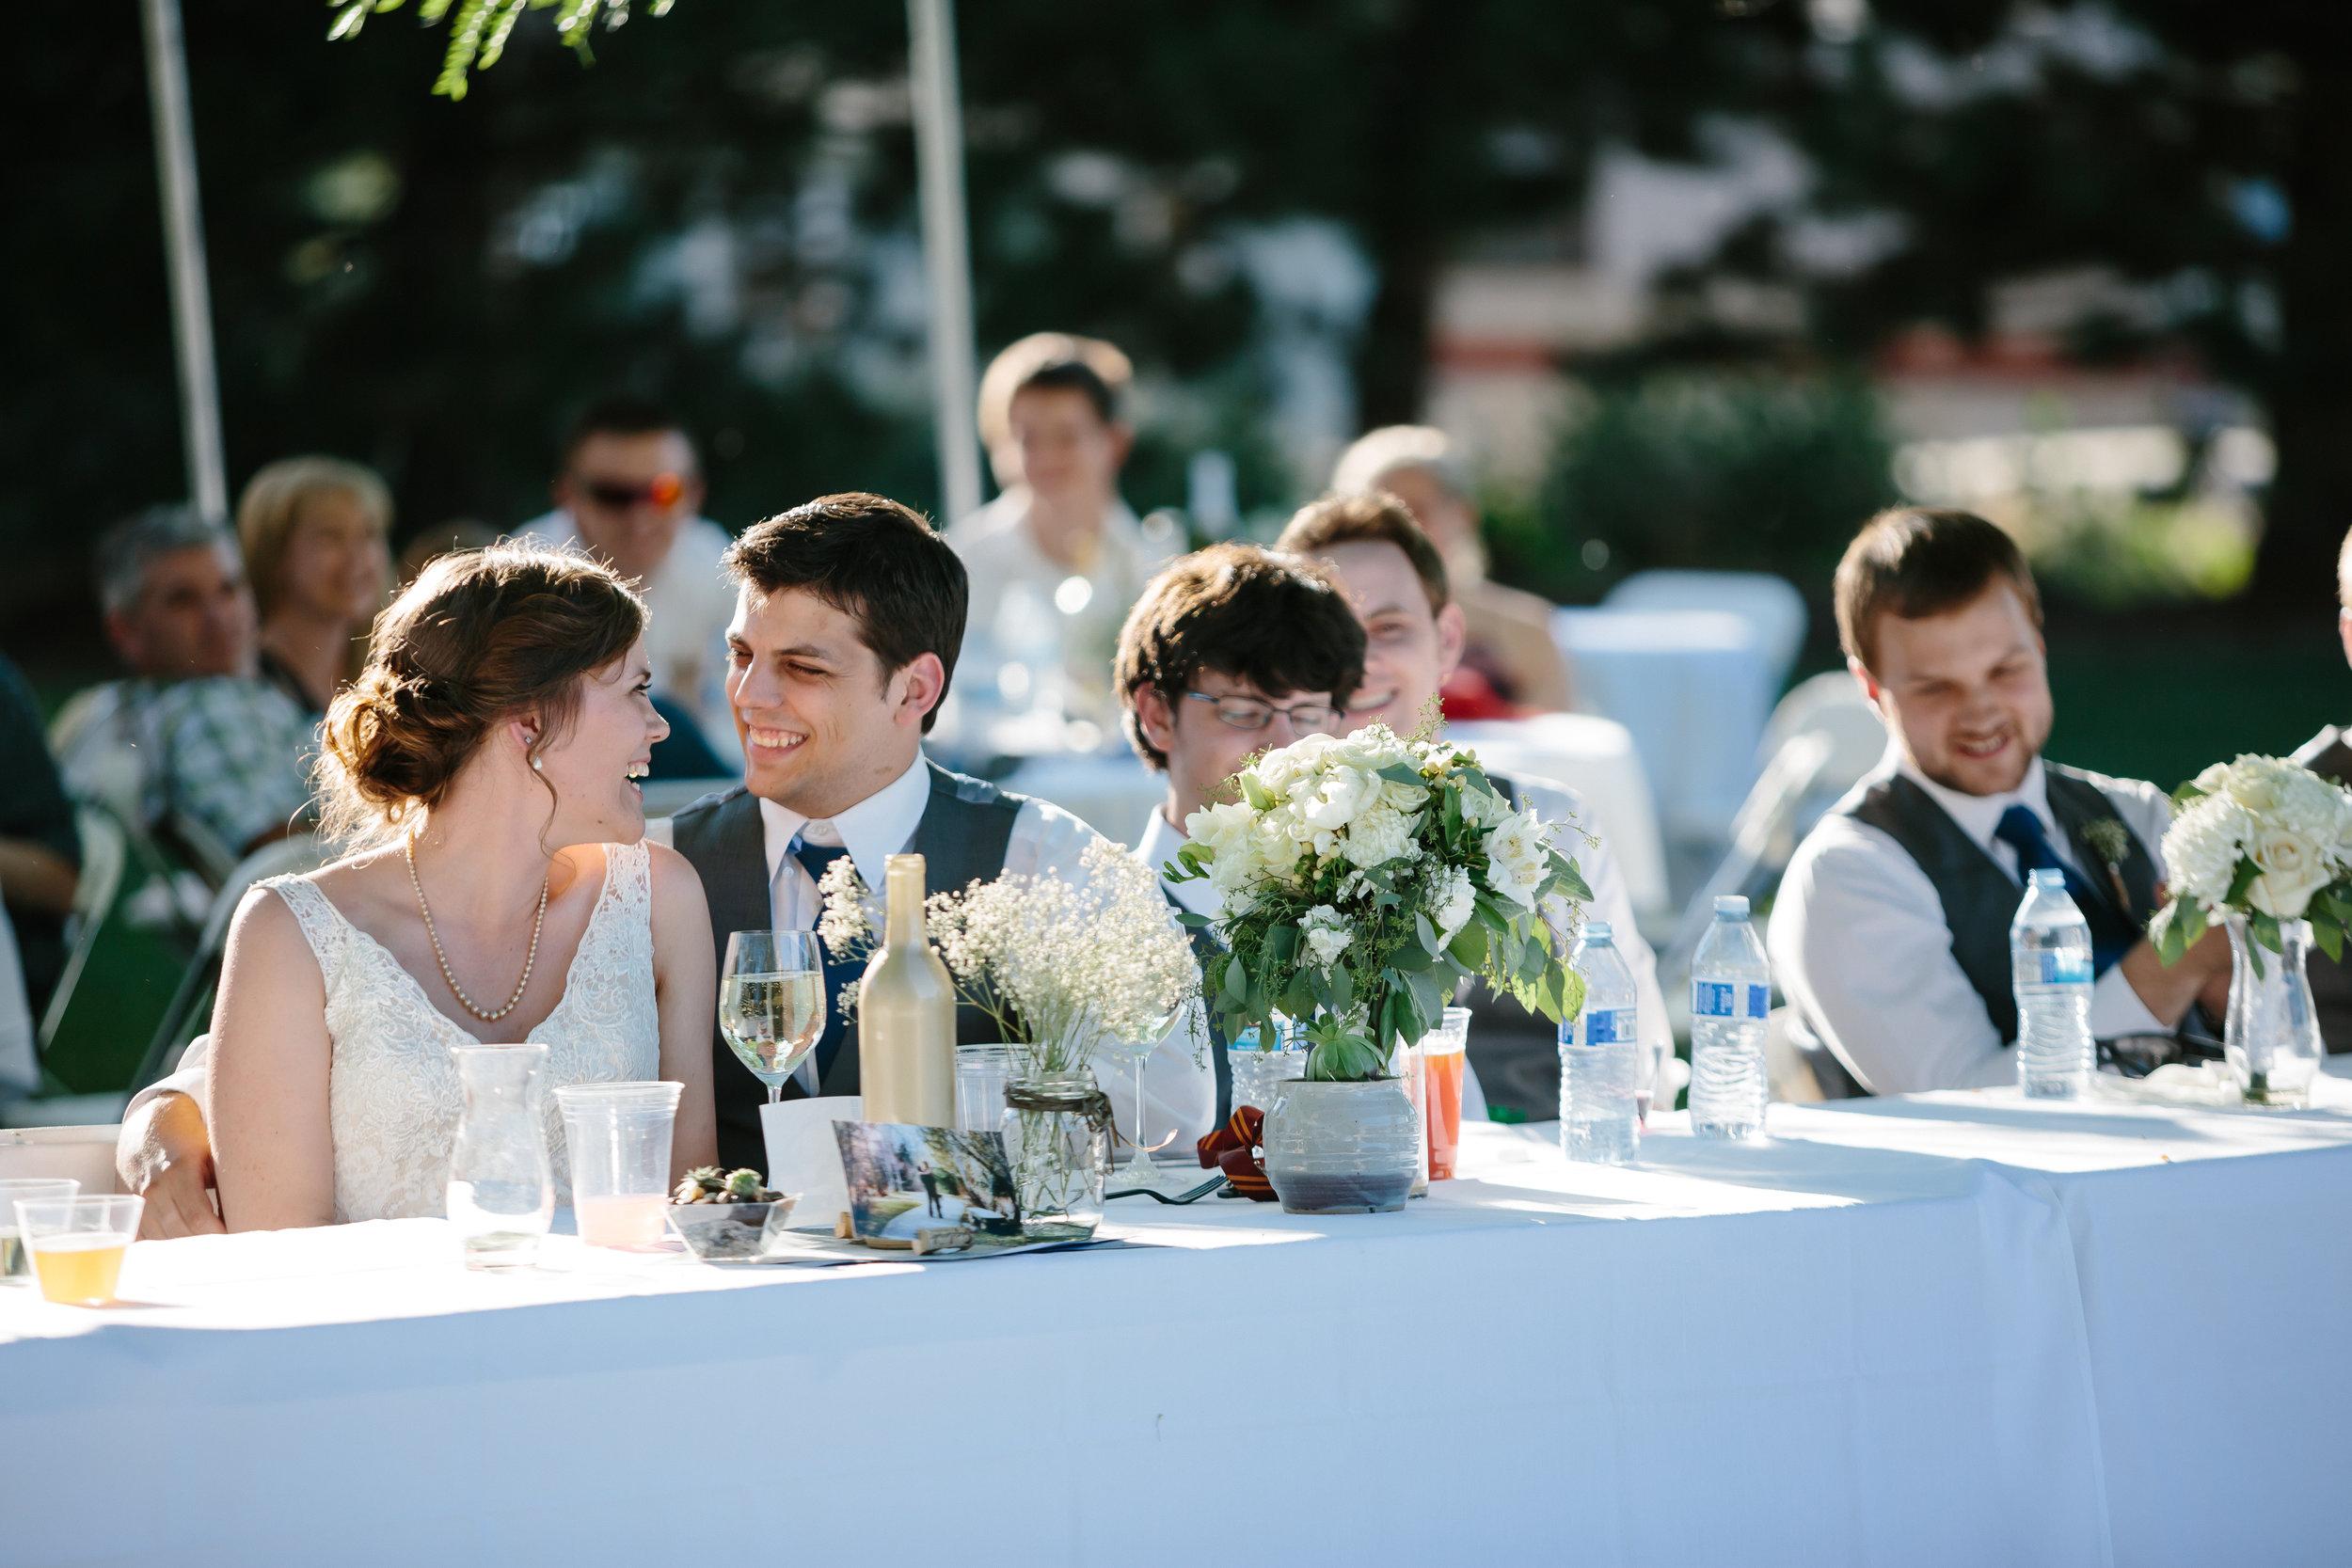 Jordan & Shantel Married - Idaho - Corrie Mick Photography-276.jpg